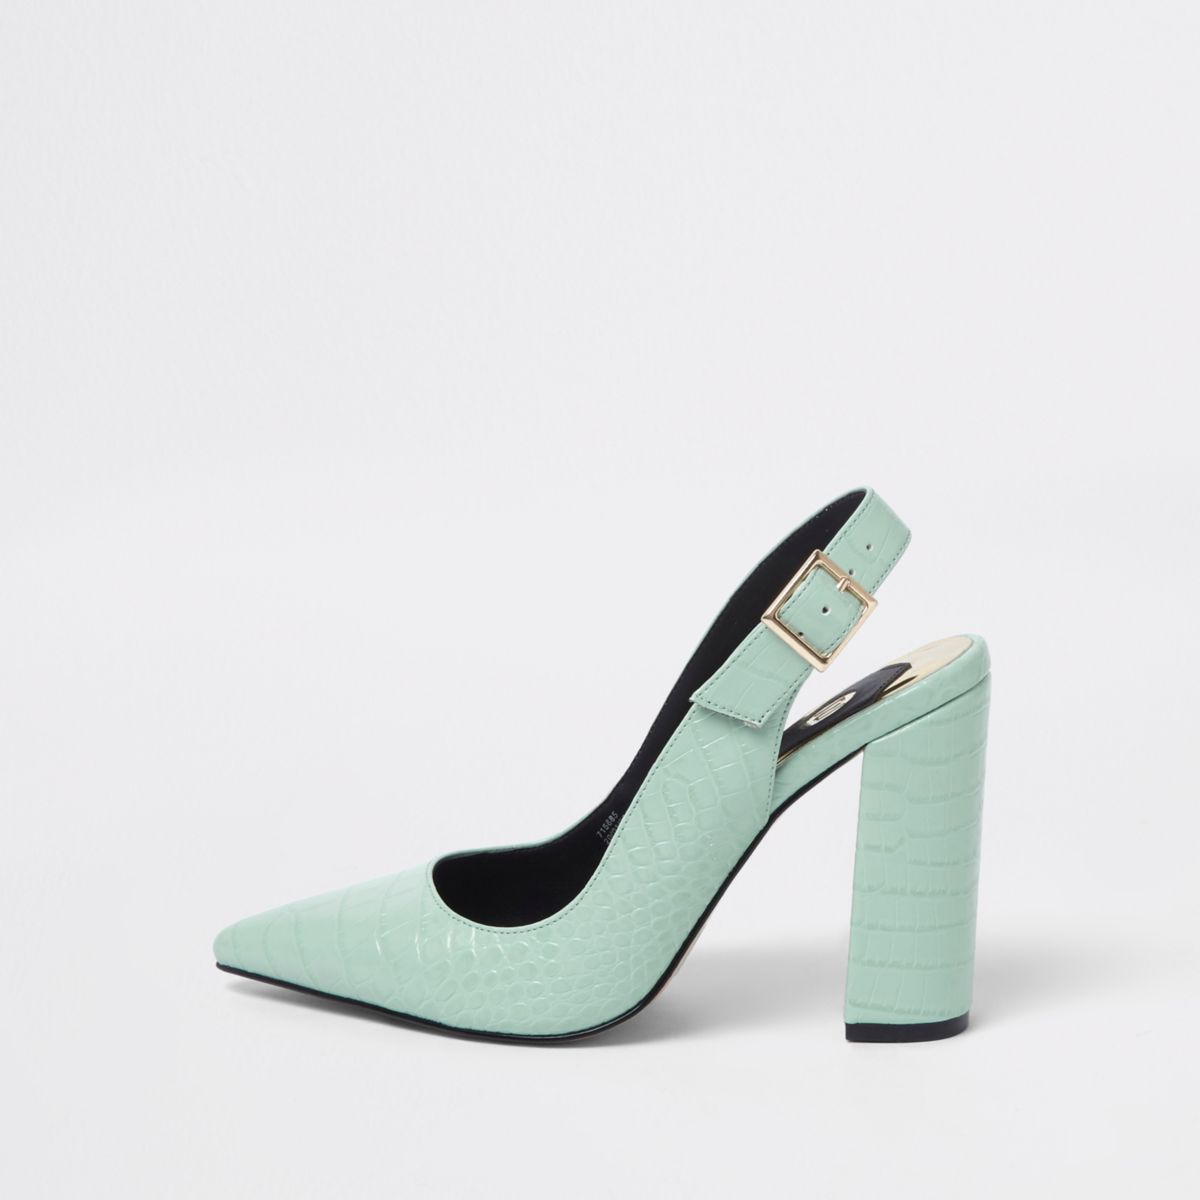 Green croc block heel sling back court shoes